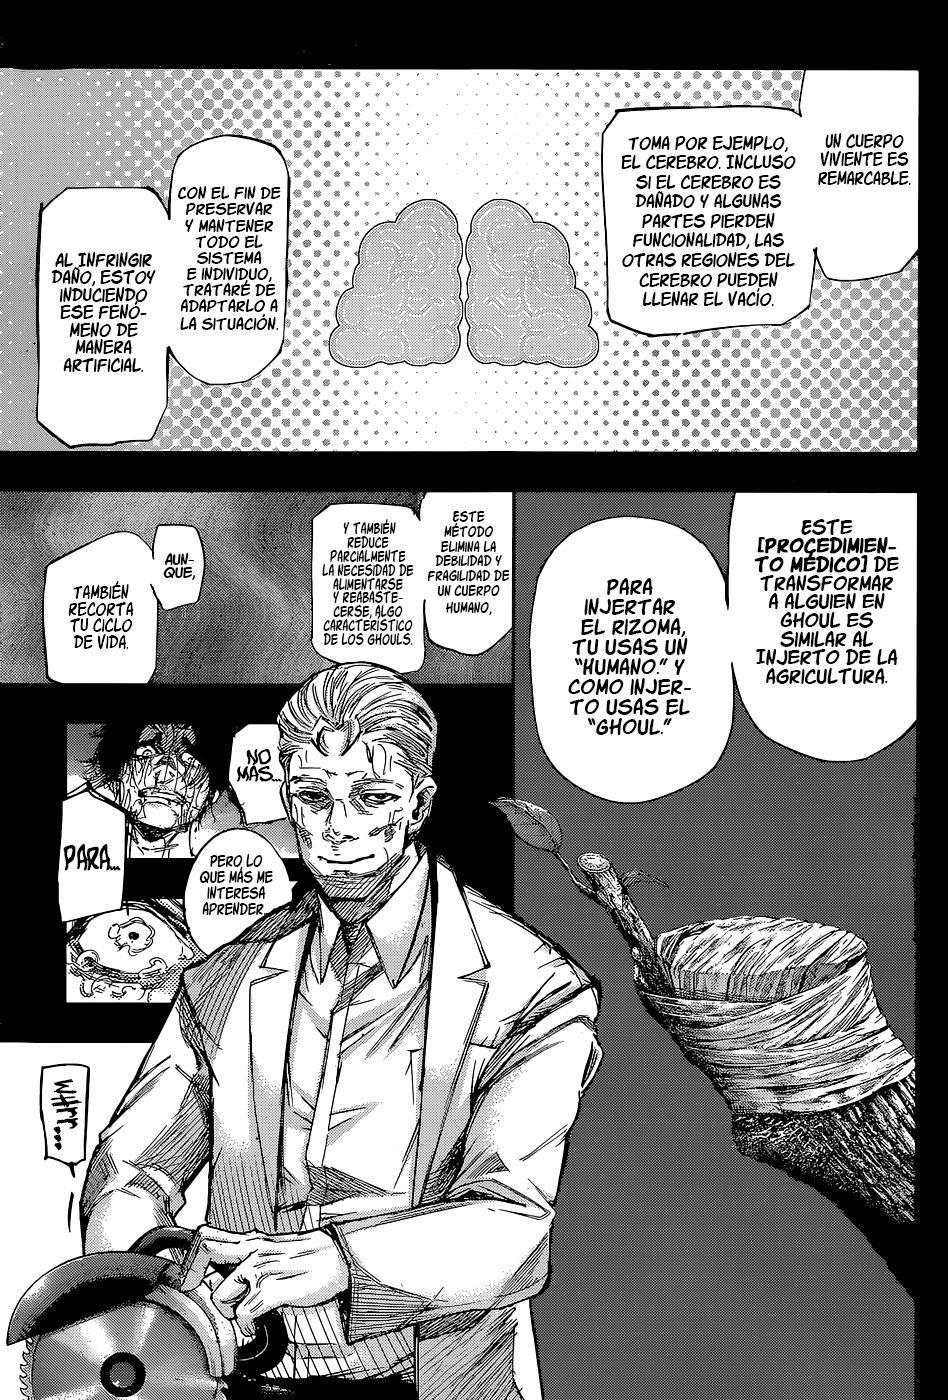 https://c5.ninemanga.com/es_manga/pic2/59/59/494698/f063d53aa3a5c845e1b246dcdd0772fa.jpg Page 10